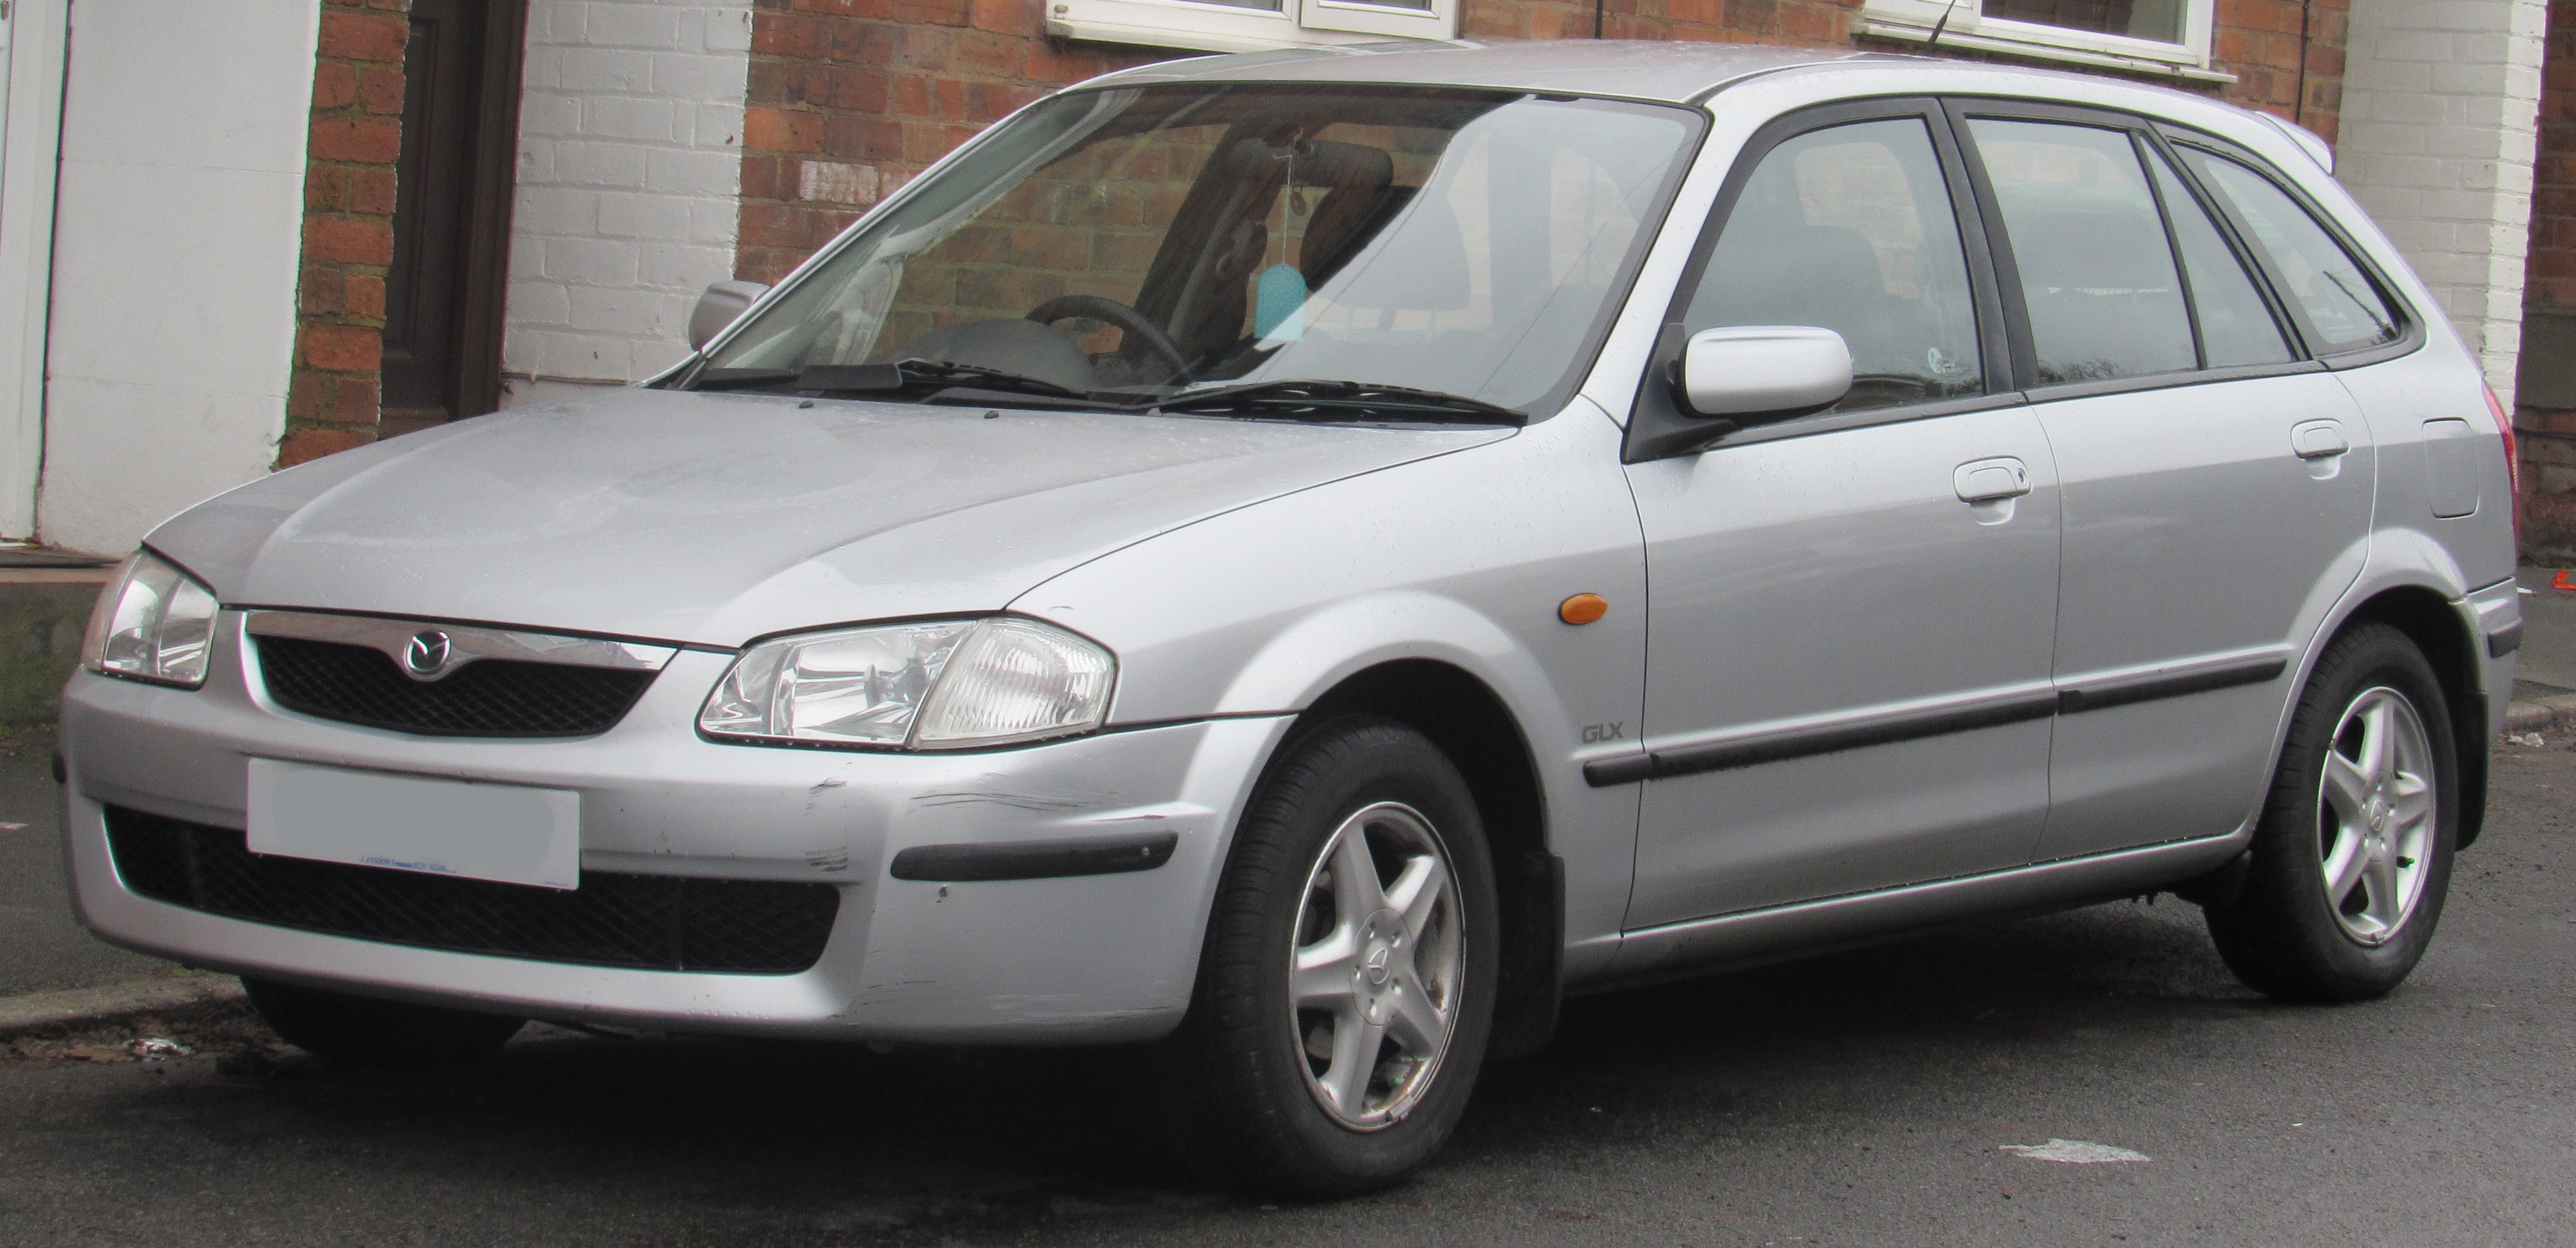 https://upload.wikimedia.org/wikipedia/commons/c/c1/2000_Mazda_323F_1.5_Front.jpg